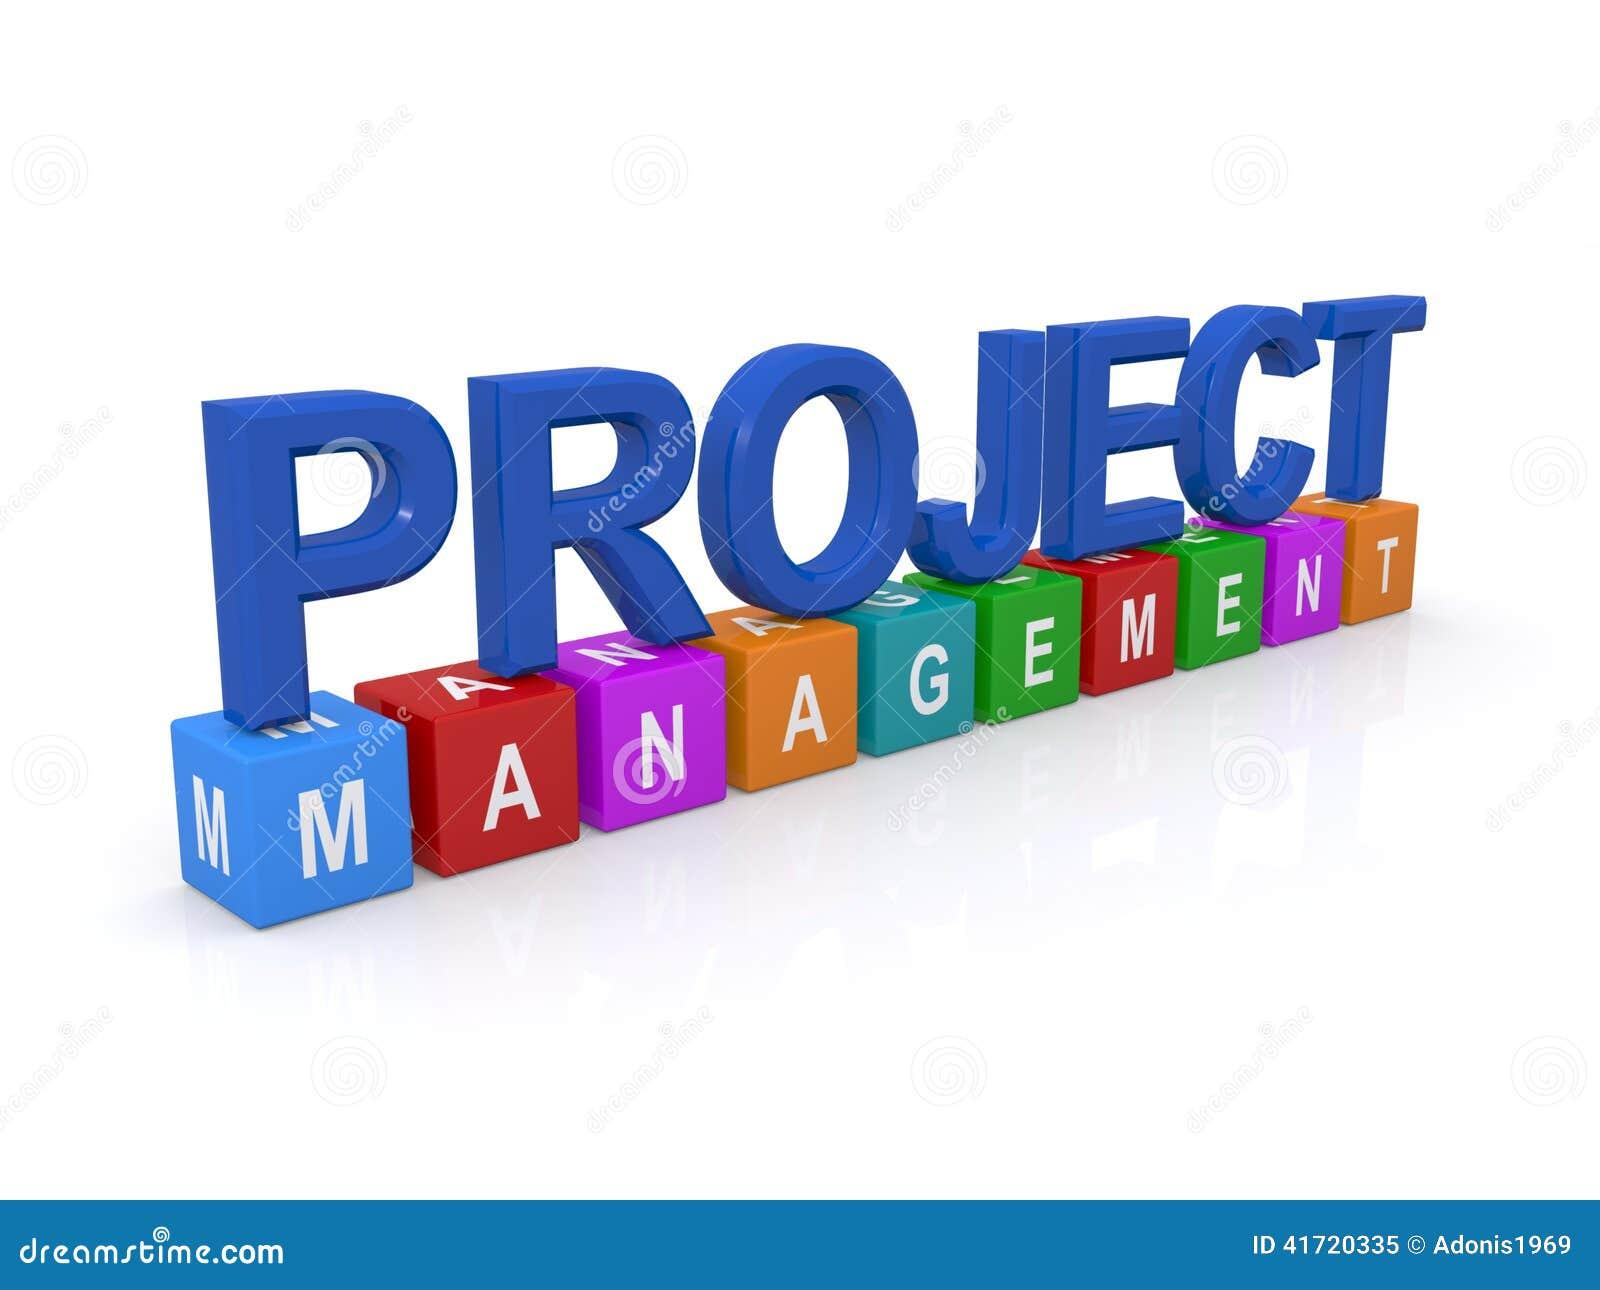 project management sign stock illustration illustration of rh dreamstime com Time Management Clip Art Clip Art Change Management